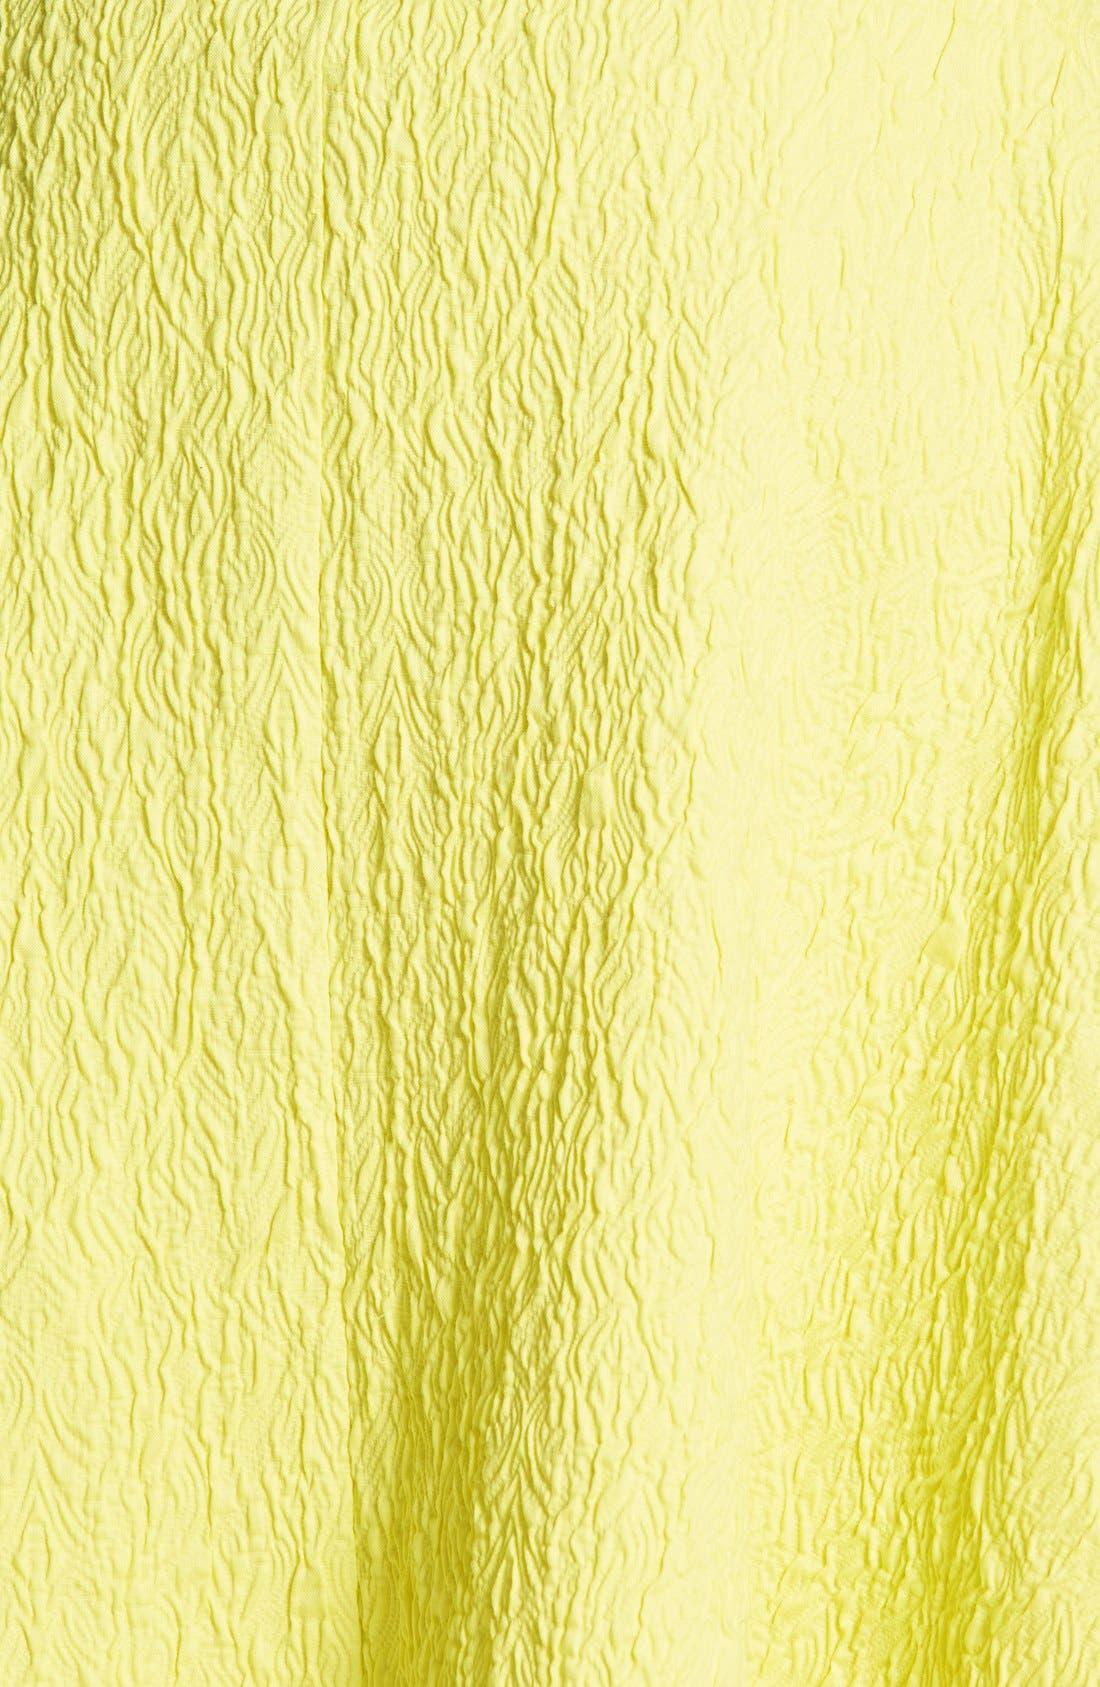 JOA Textured A-Line Midi Skirt,                             Alternate thumbnail 3, color,                             Lemon